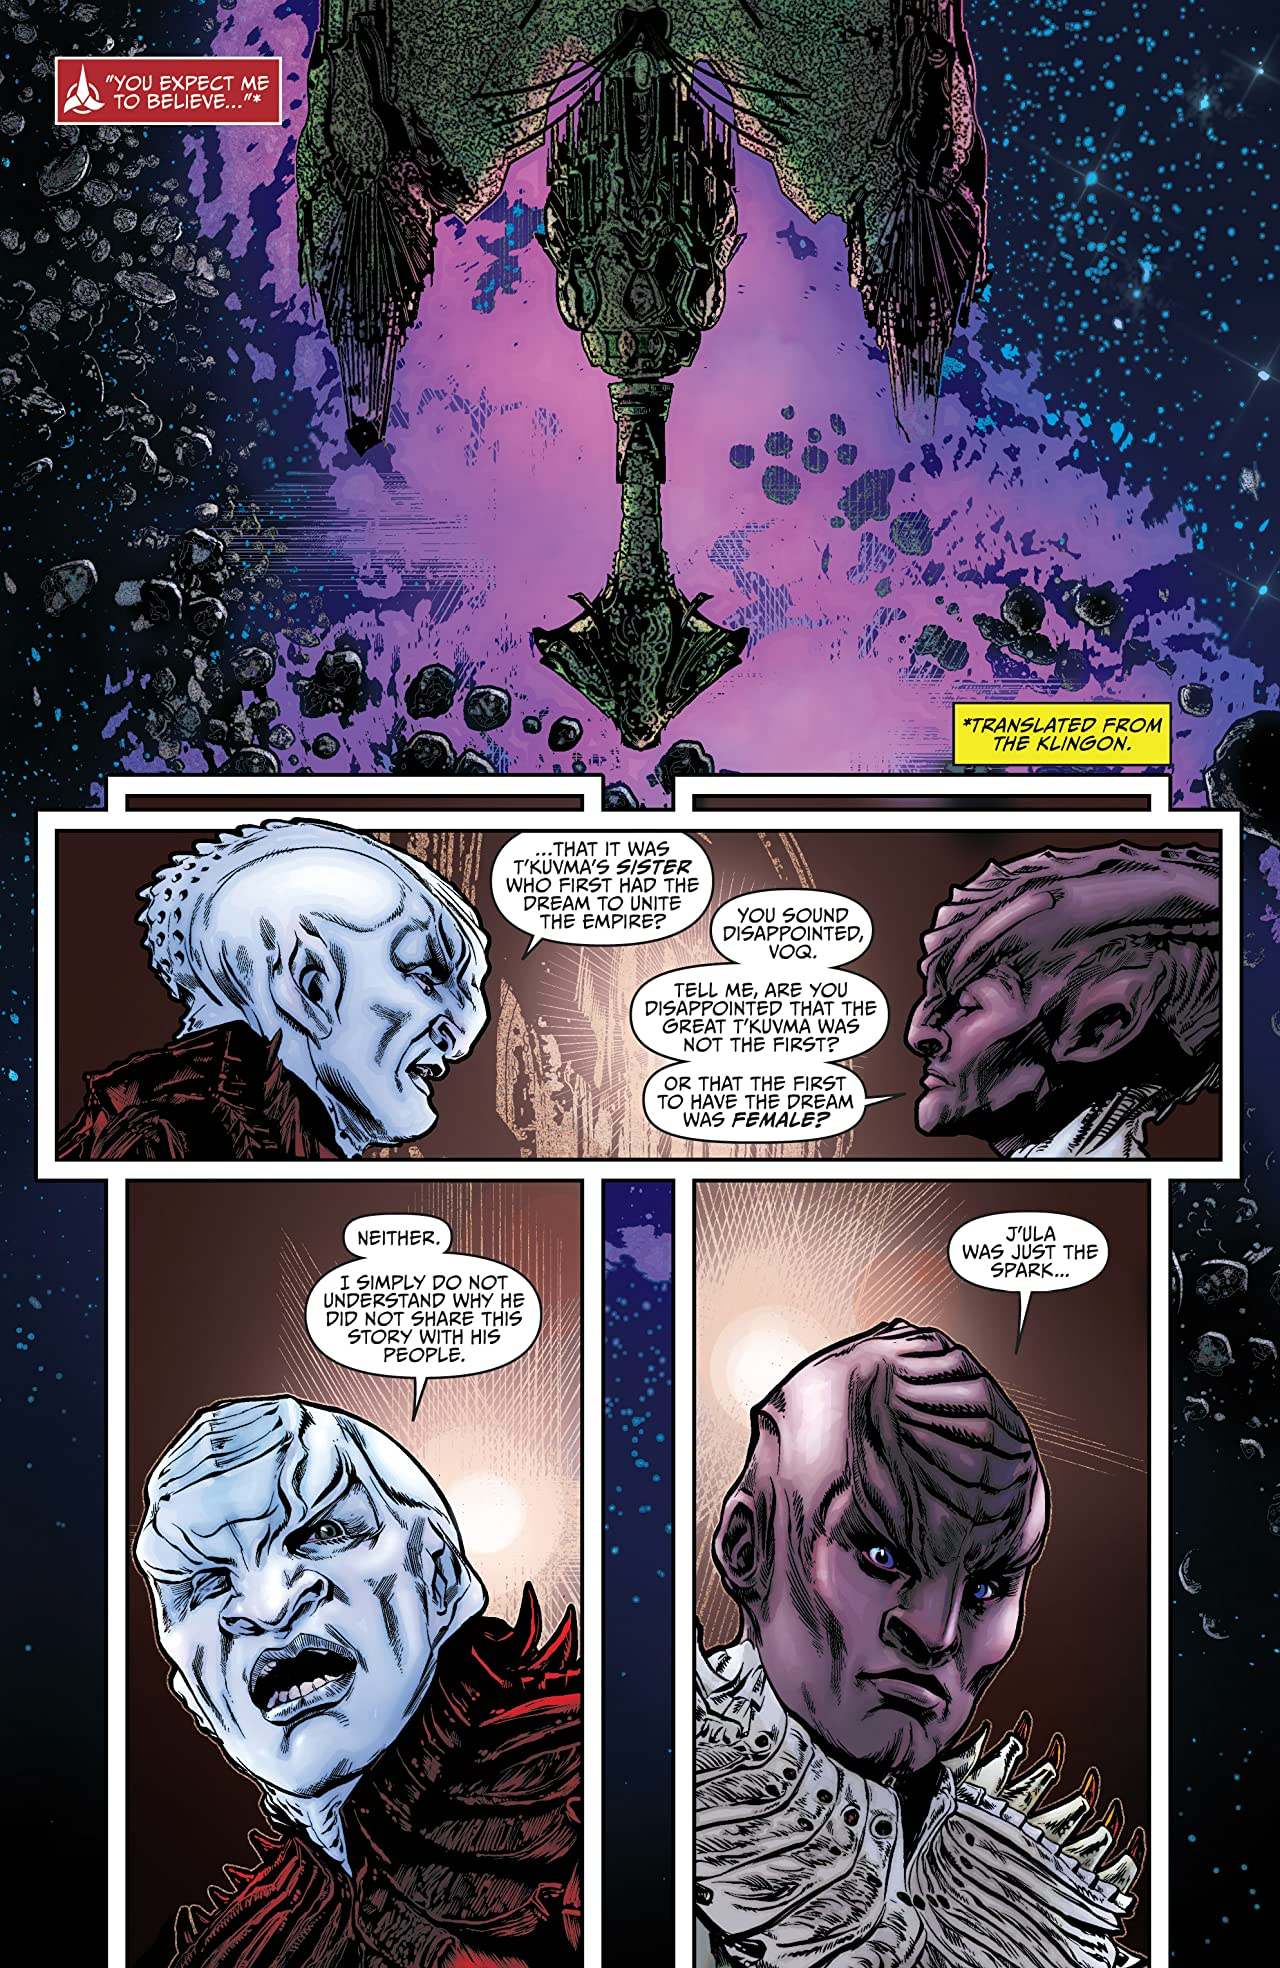 Star Trek: Discovery #2